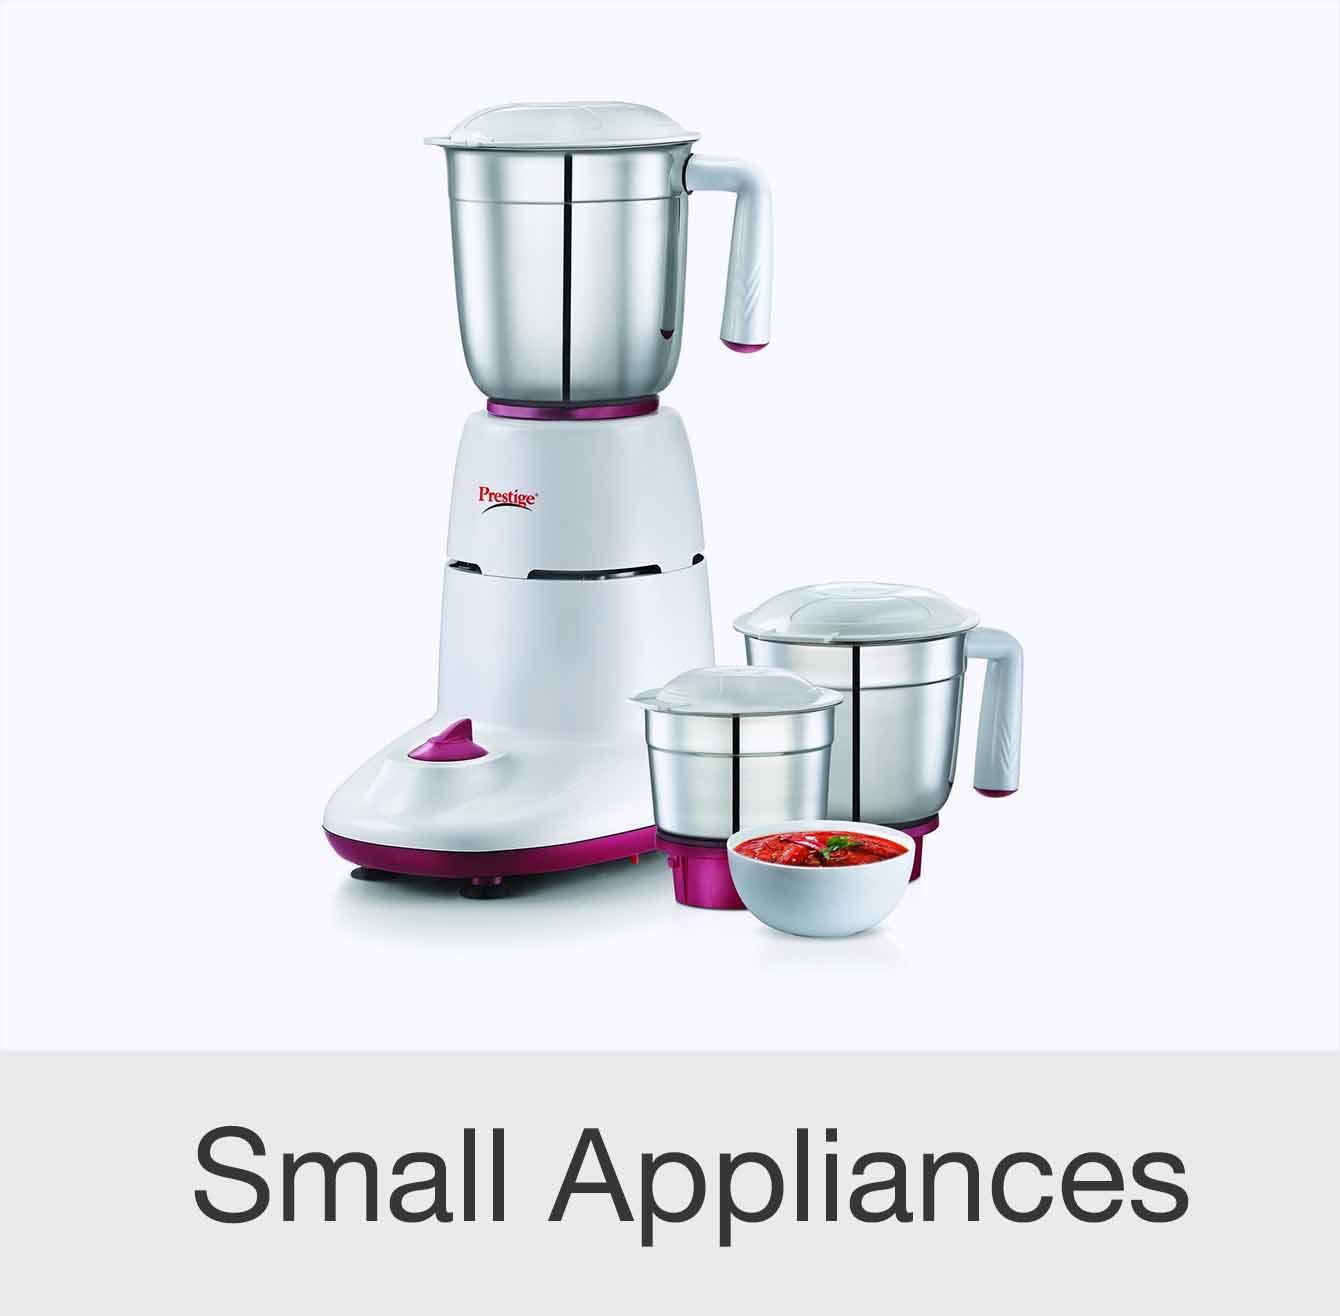 kitchen appliances online shopping offers shopping kitchen furniture pieces shipped furniture online kitchen cabinets online